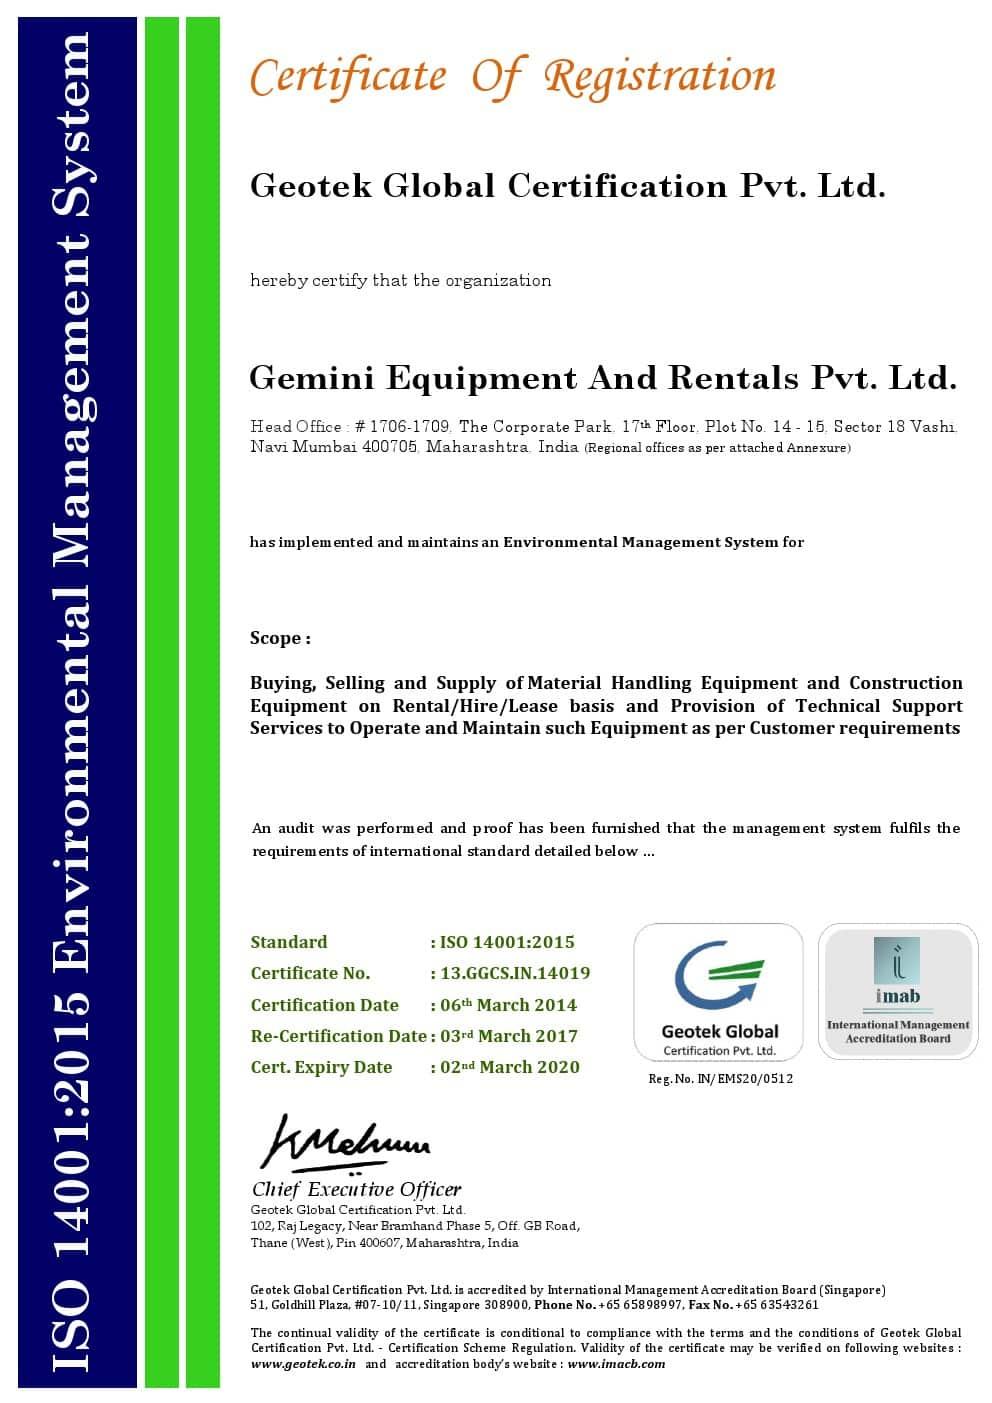 registration-certificate-1